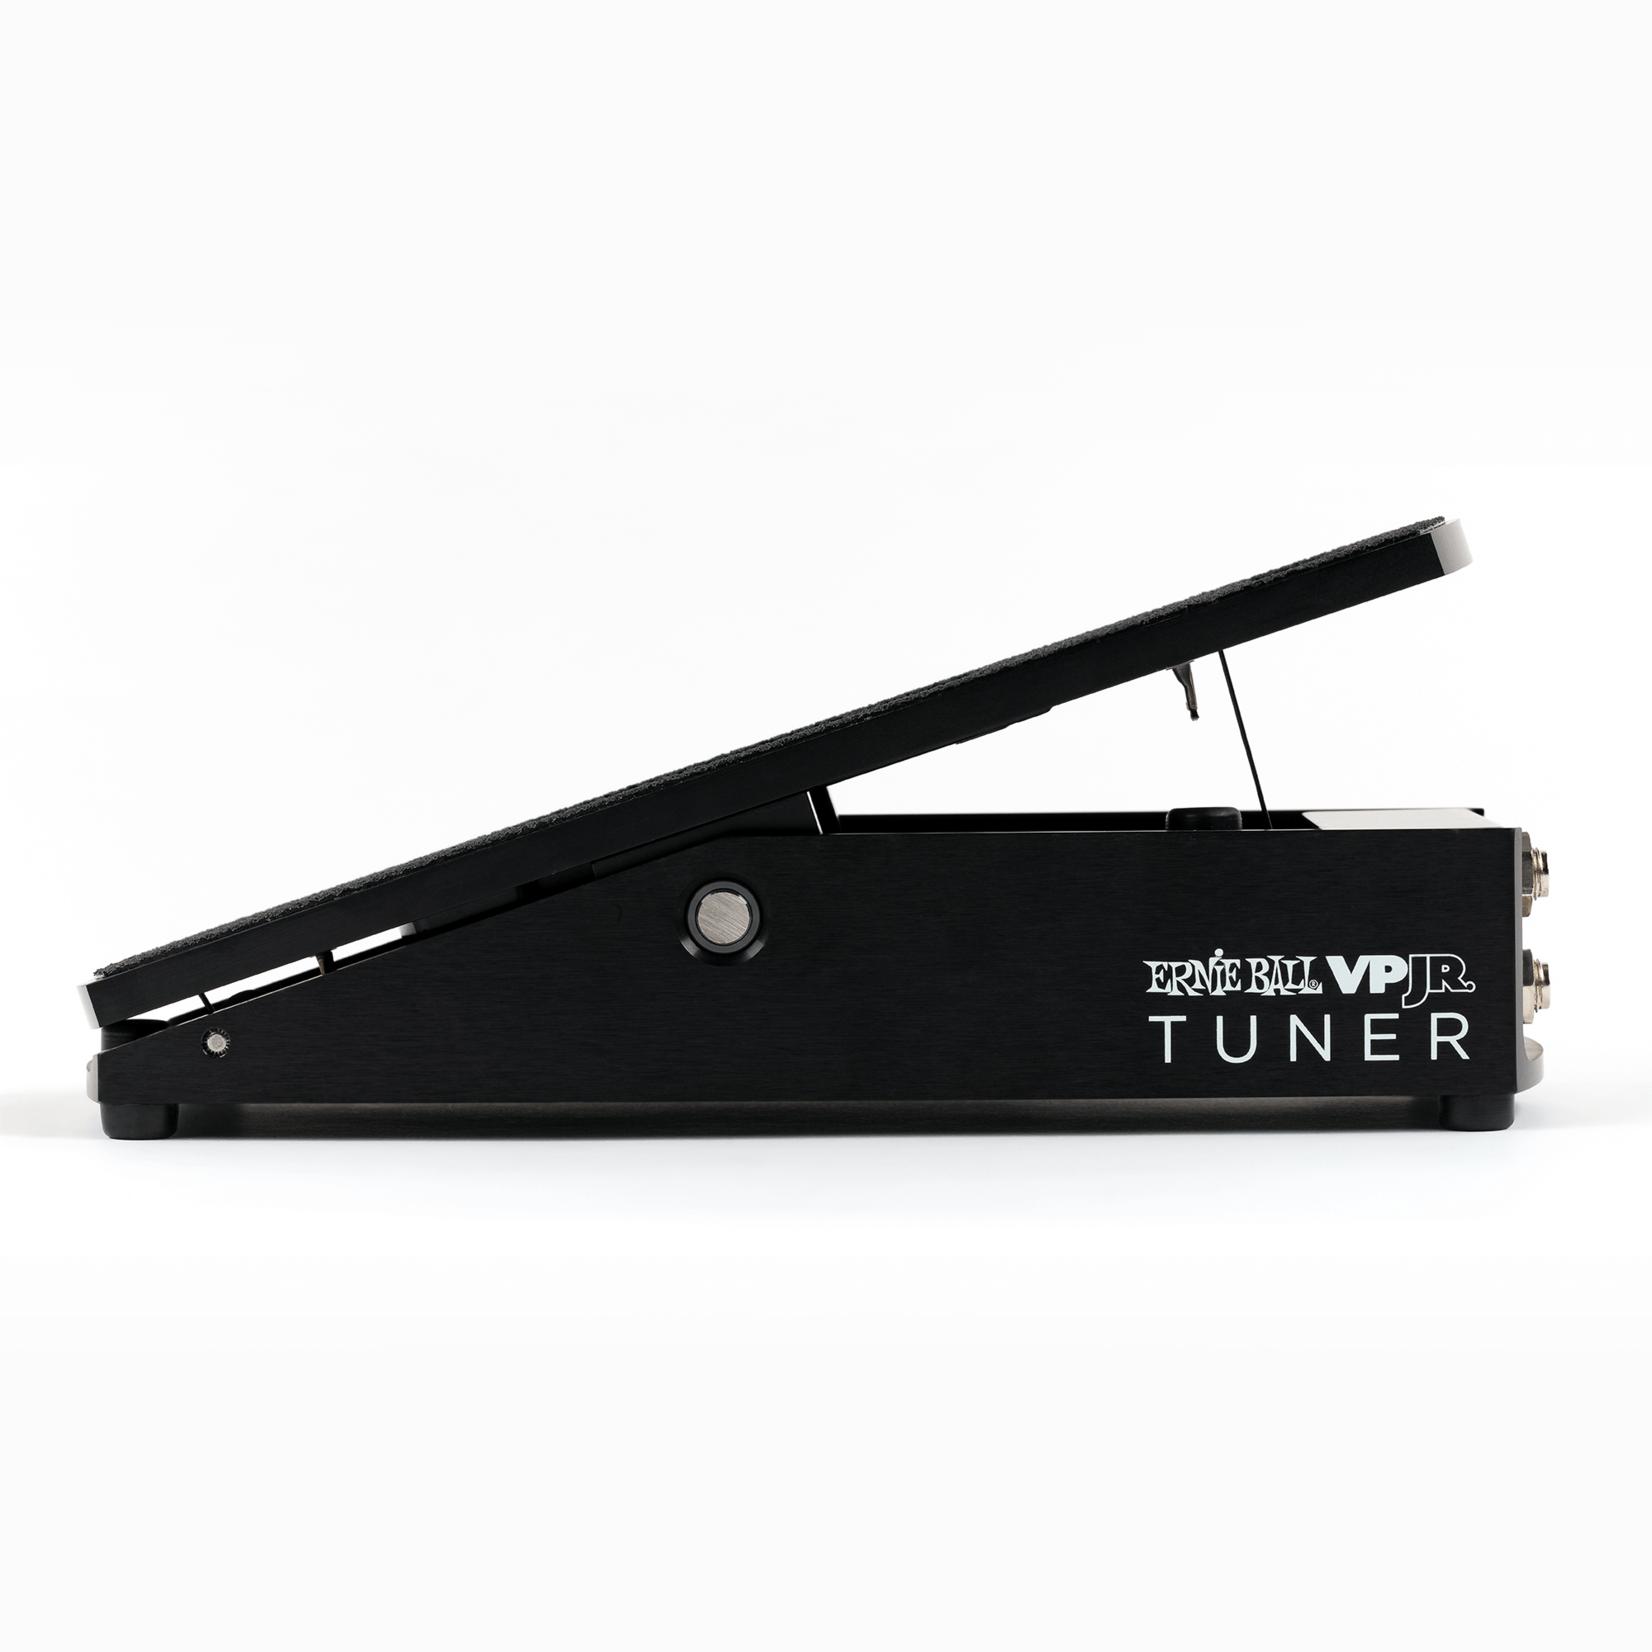 Ernie Ball Ernie Ball VPJR Tuner - Black (Volume and Tuner Pedal in One!)